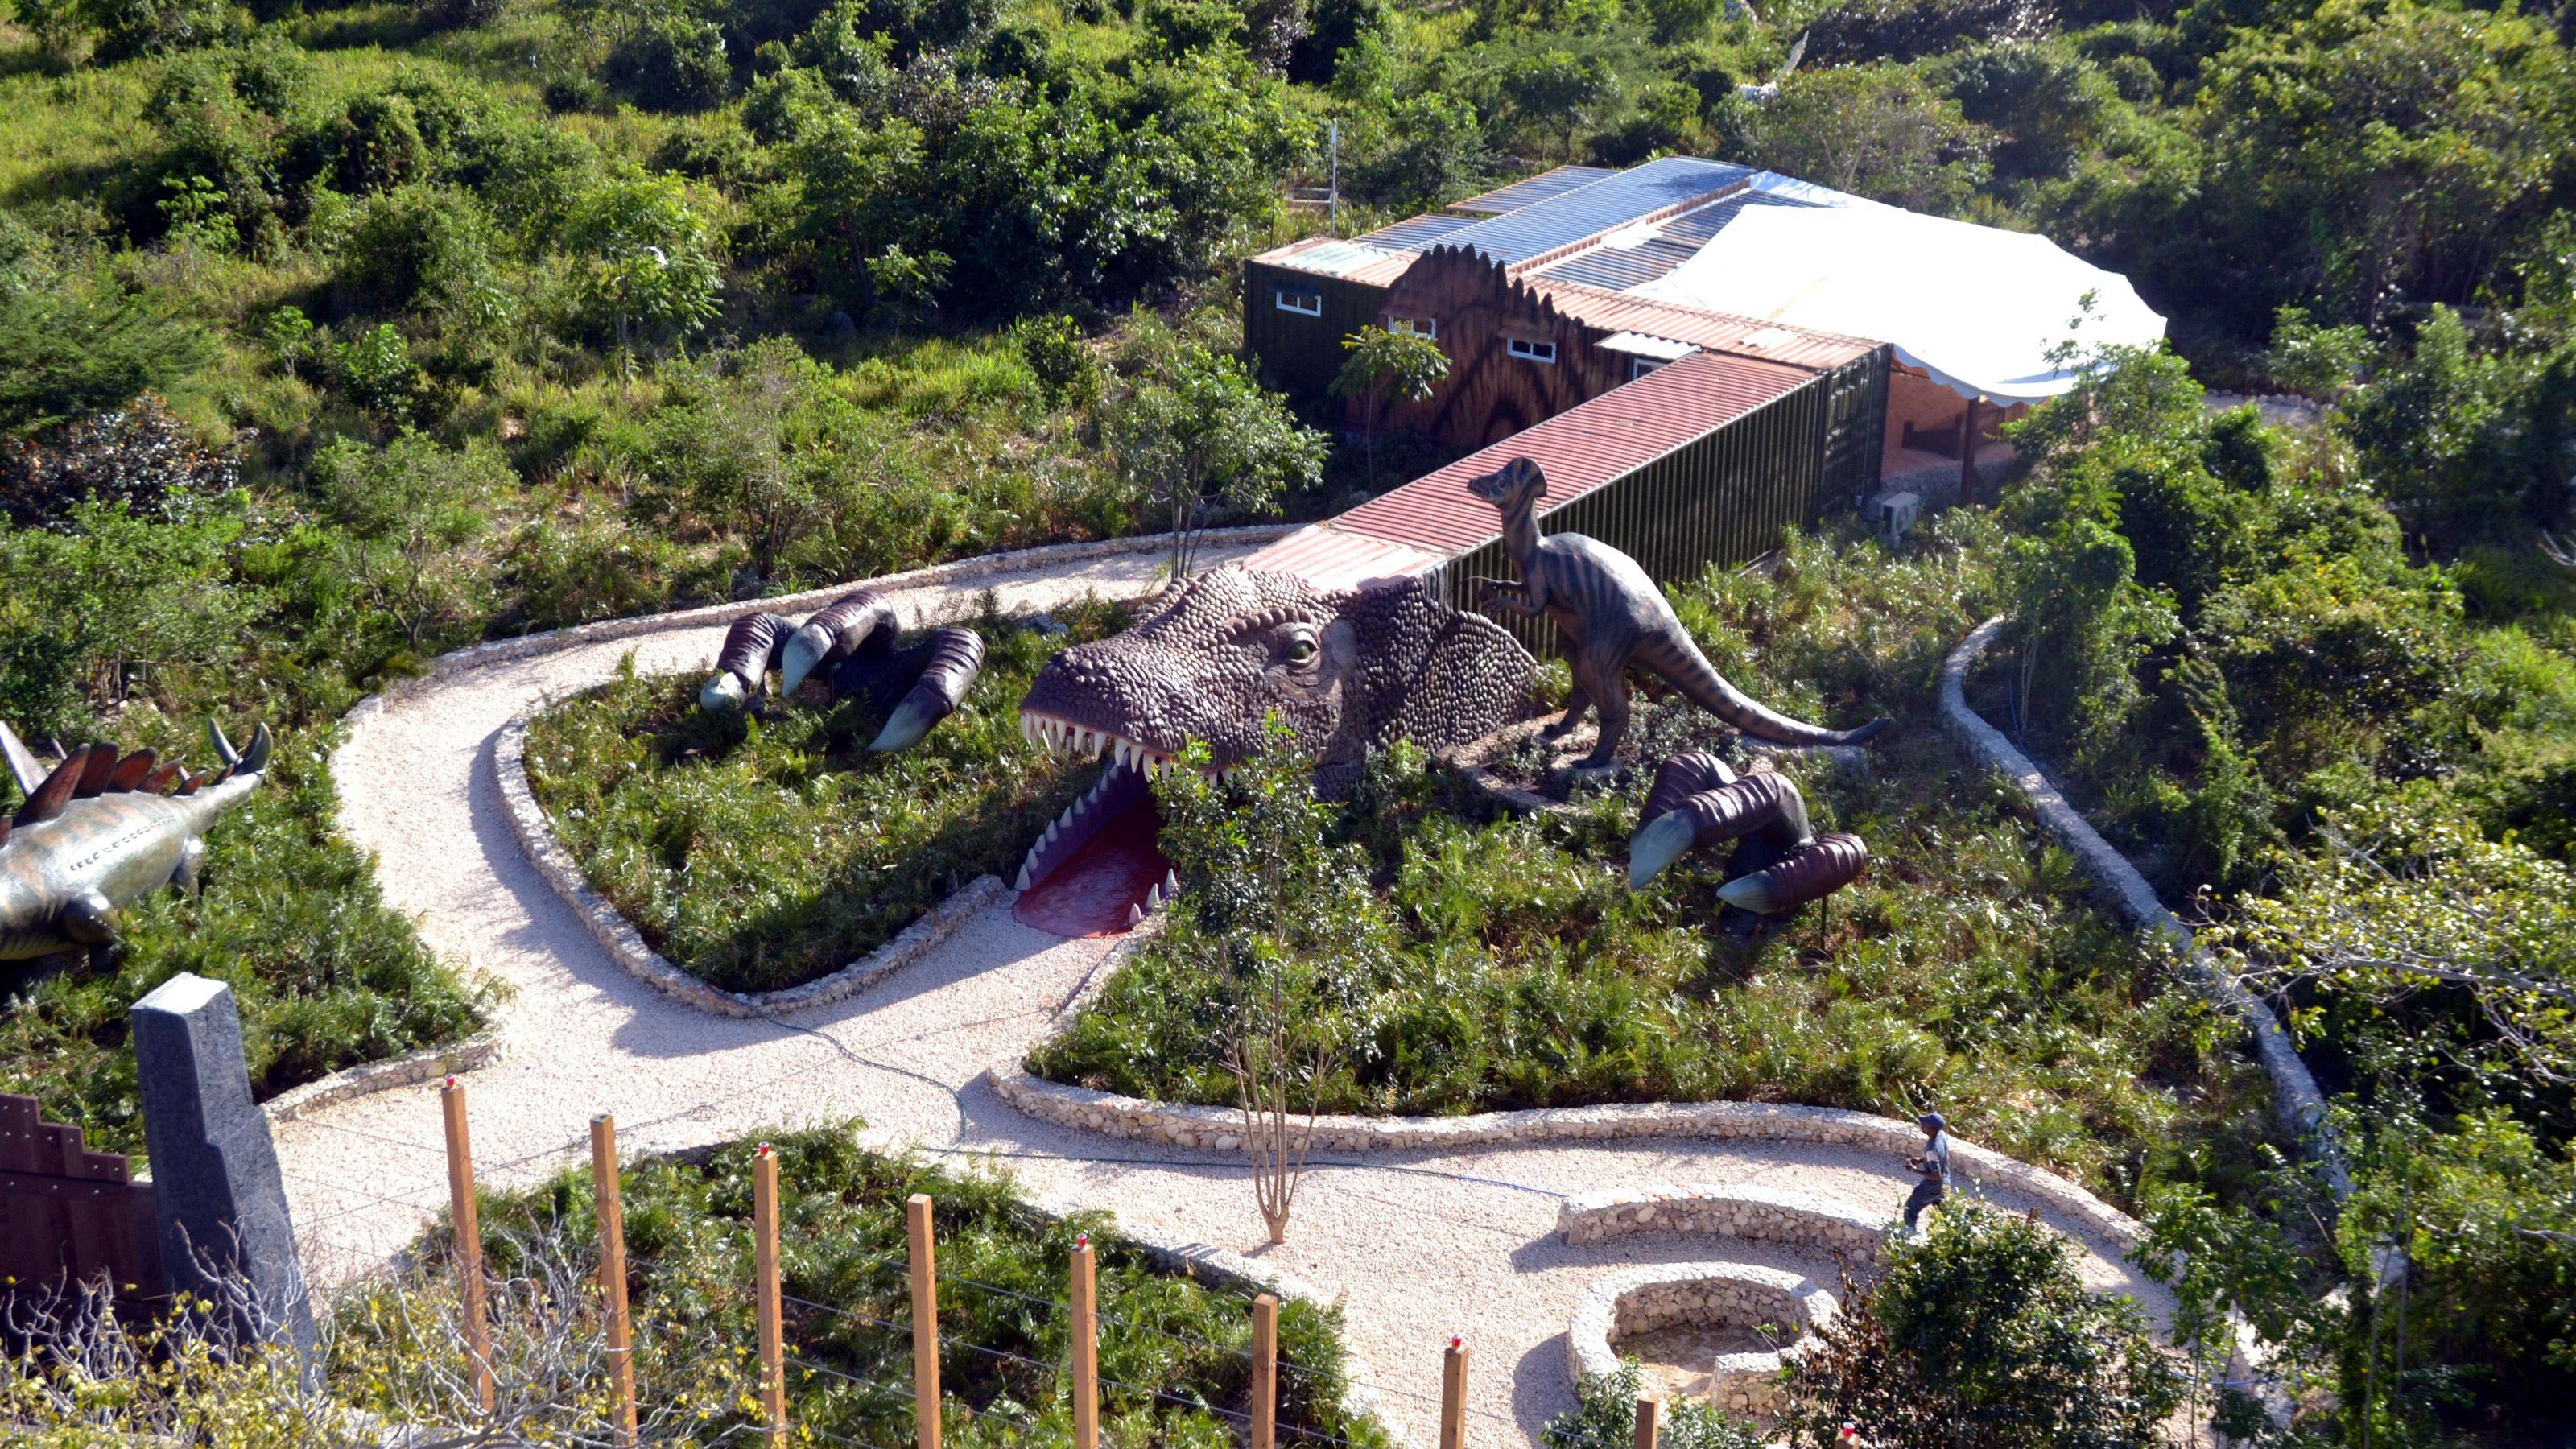 ariel view of dinosaur park in Santo Domingo